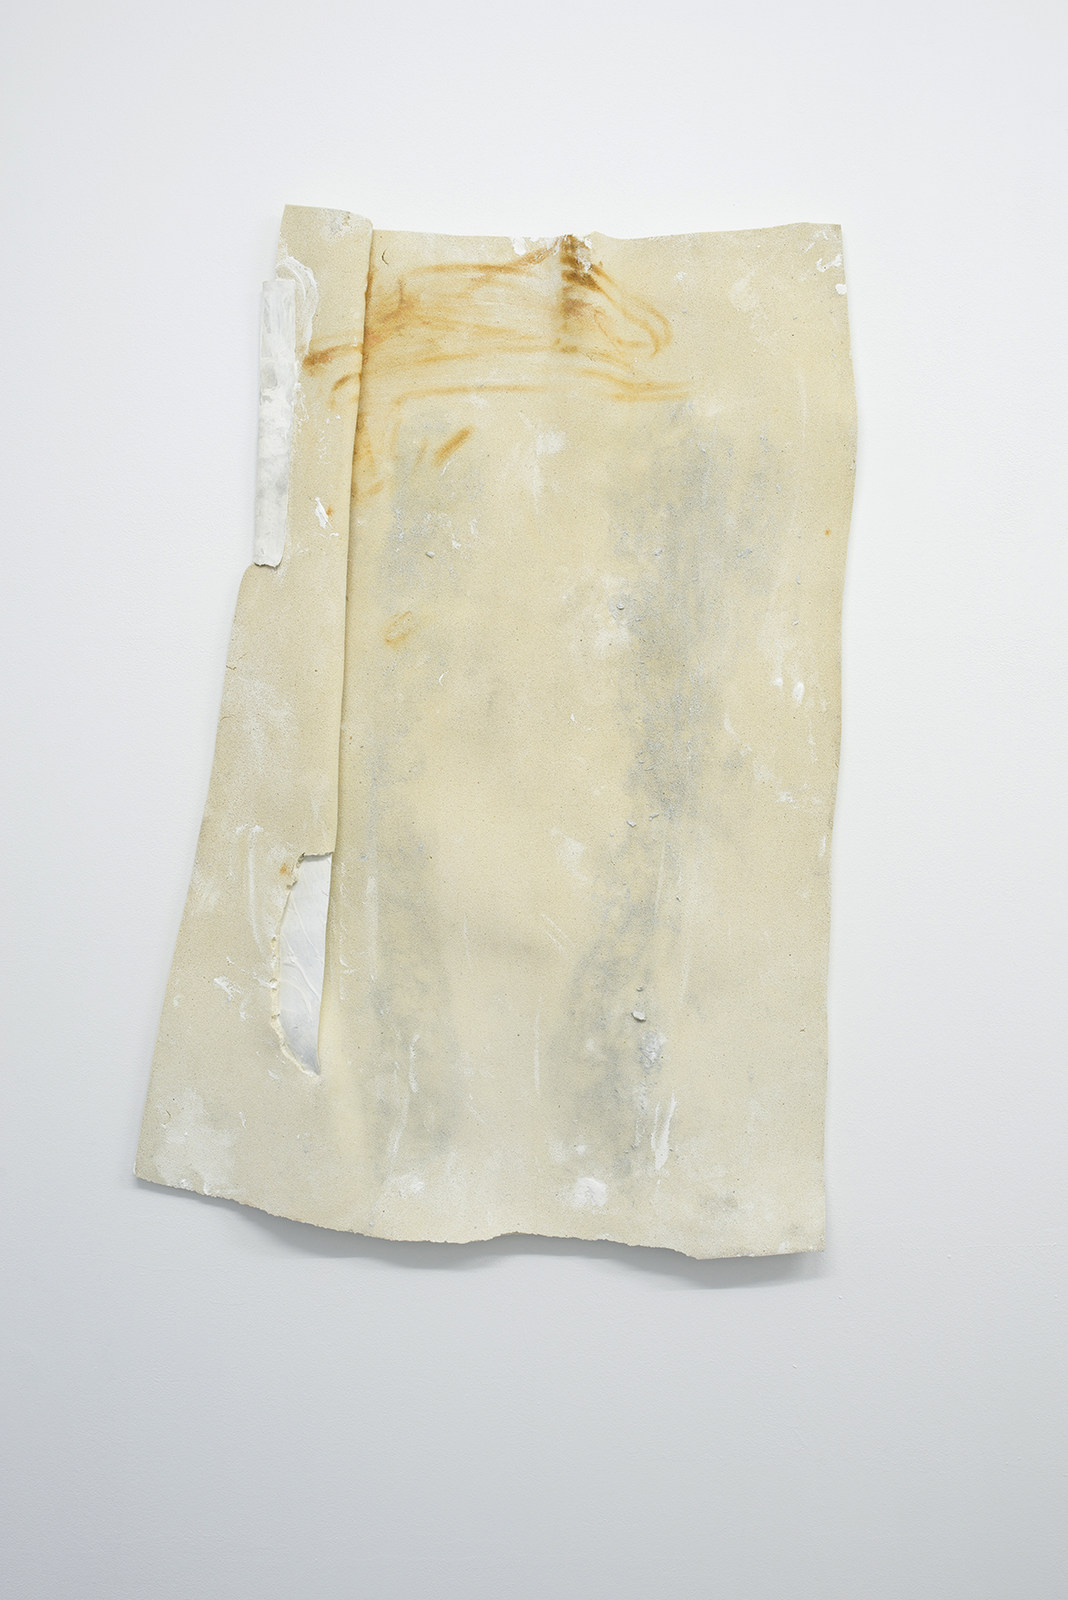 Lydia Gifford, 'Tidal', 2016